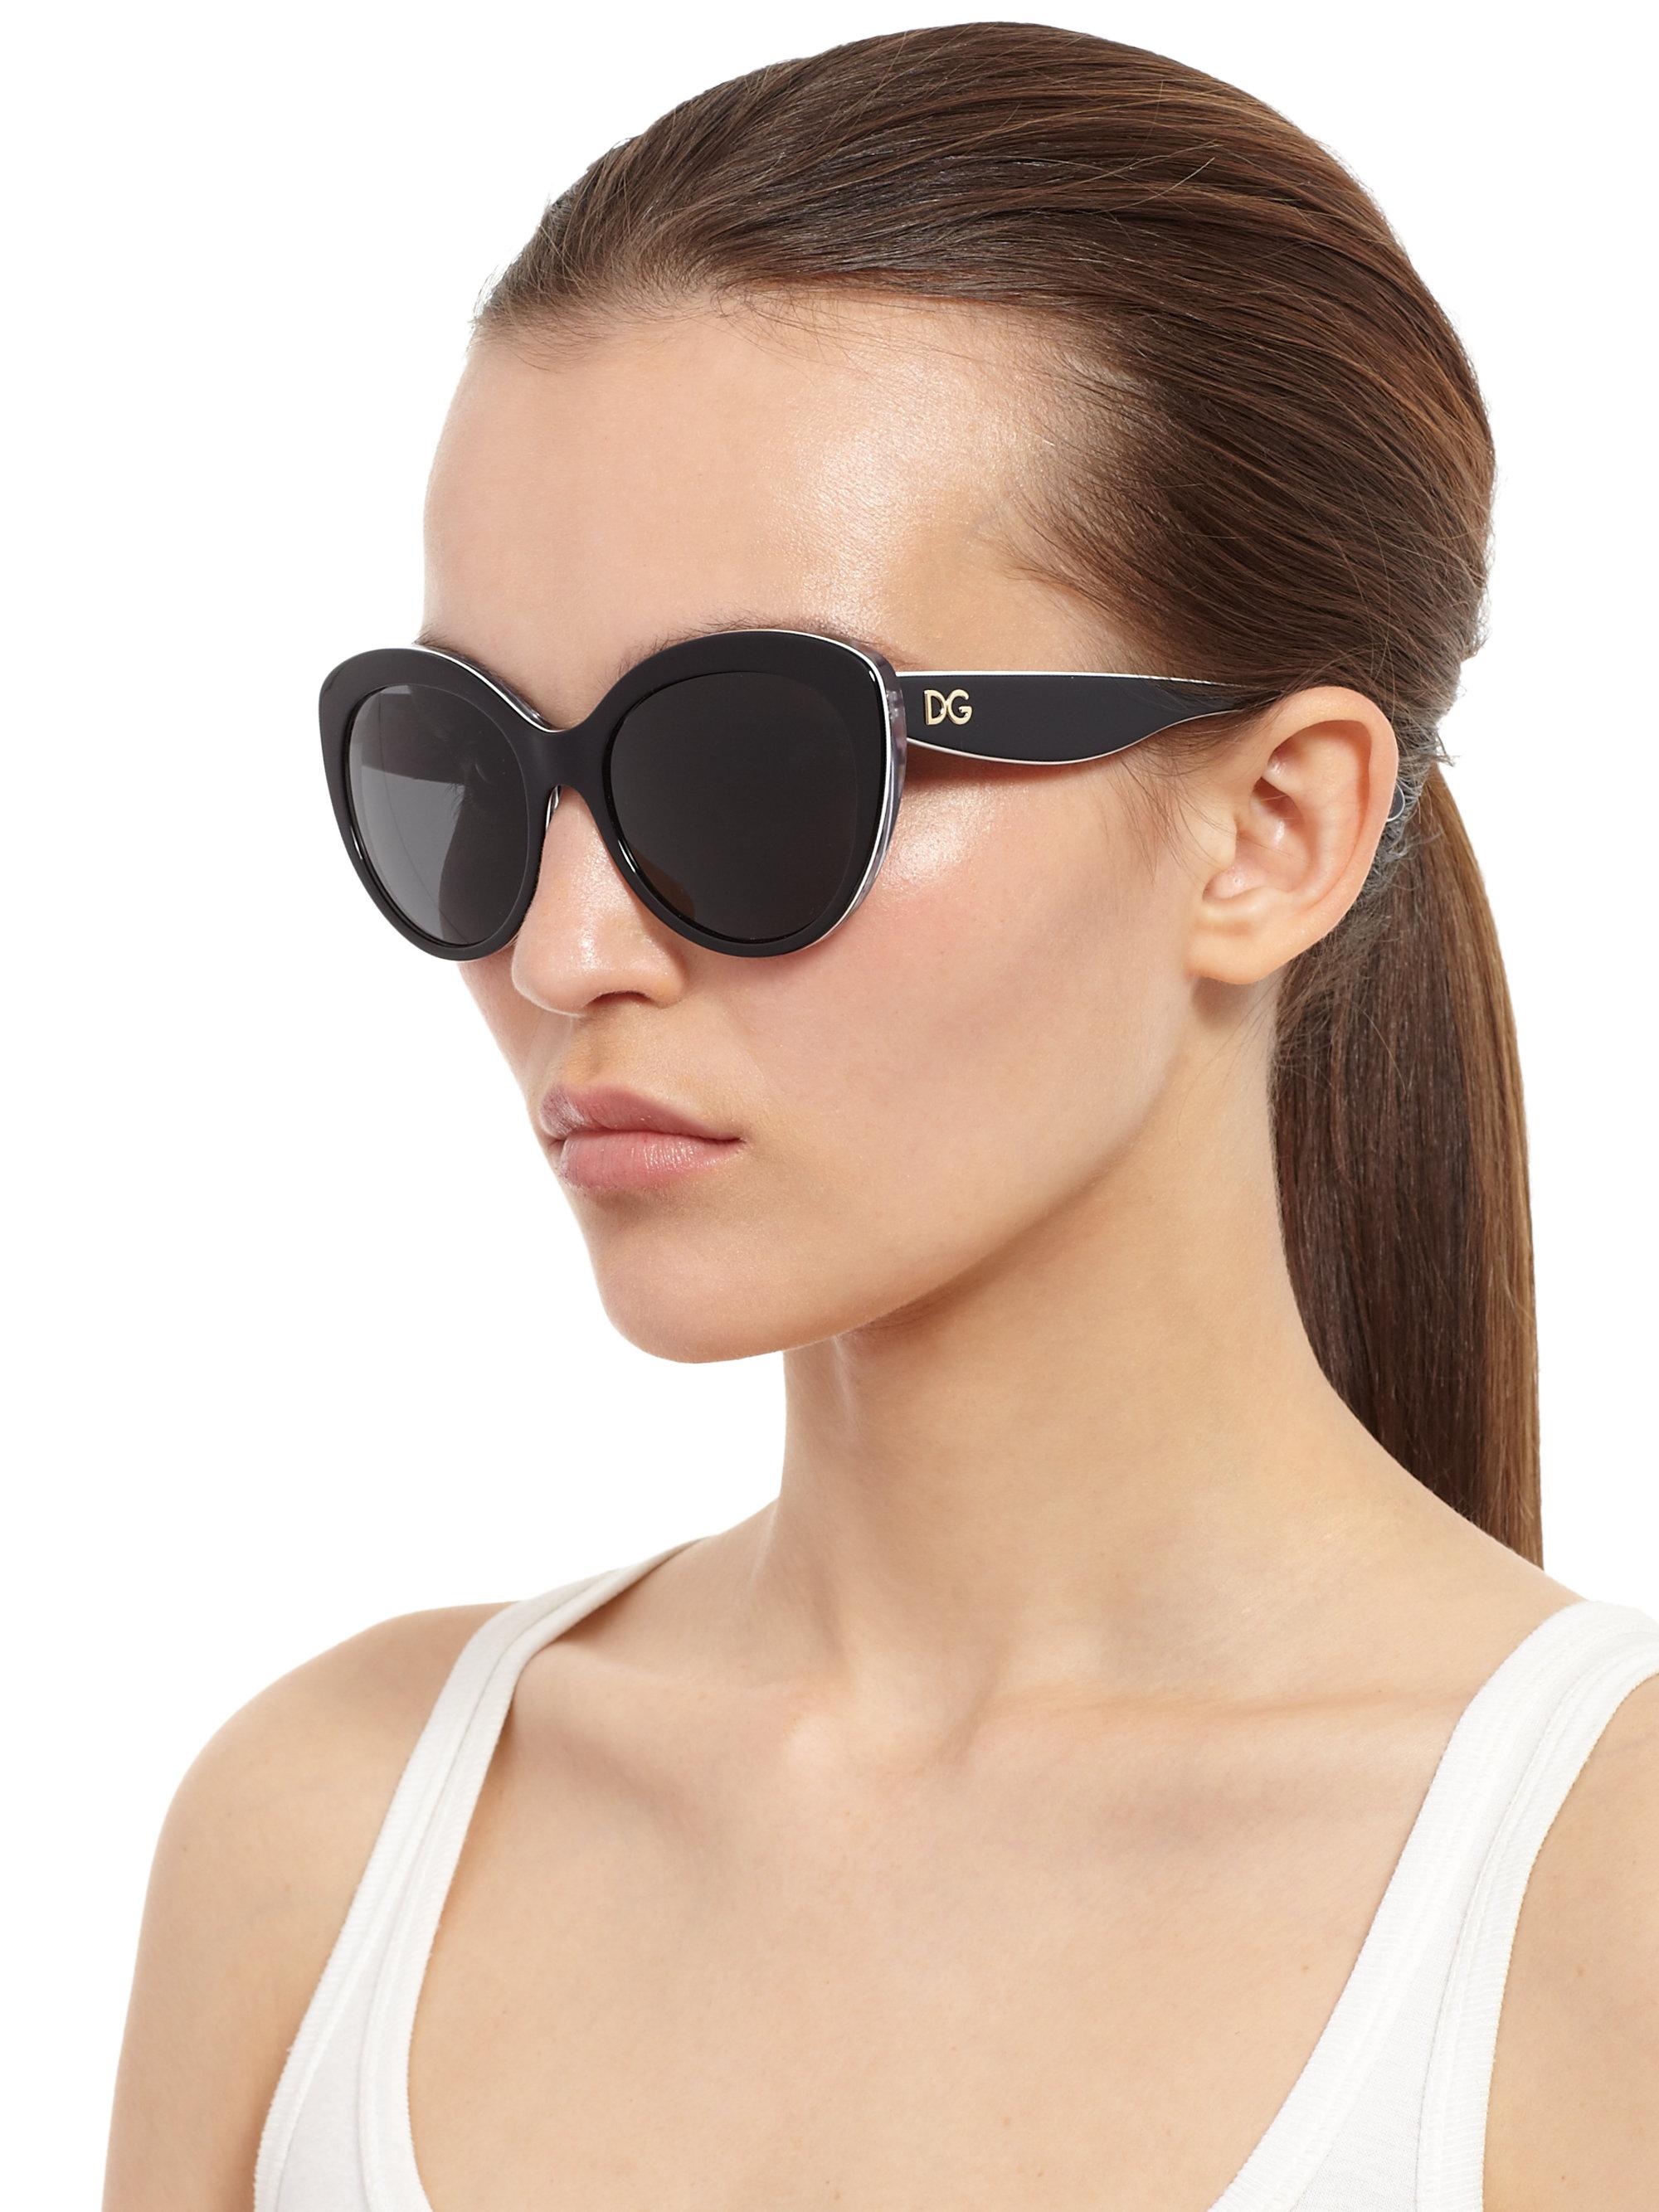 808b44311 Dolce & Gabbana Cat'S-Eye Sunglasses in Black - Lyst